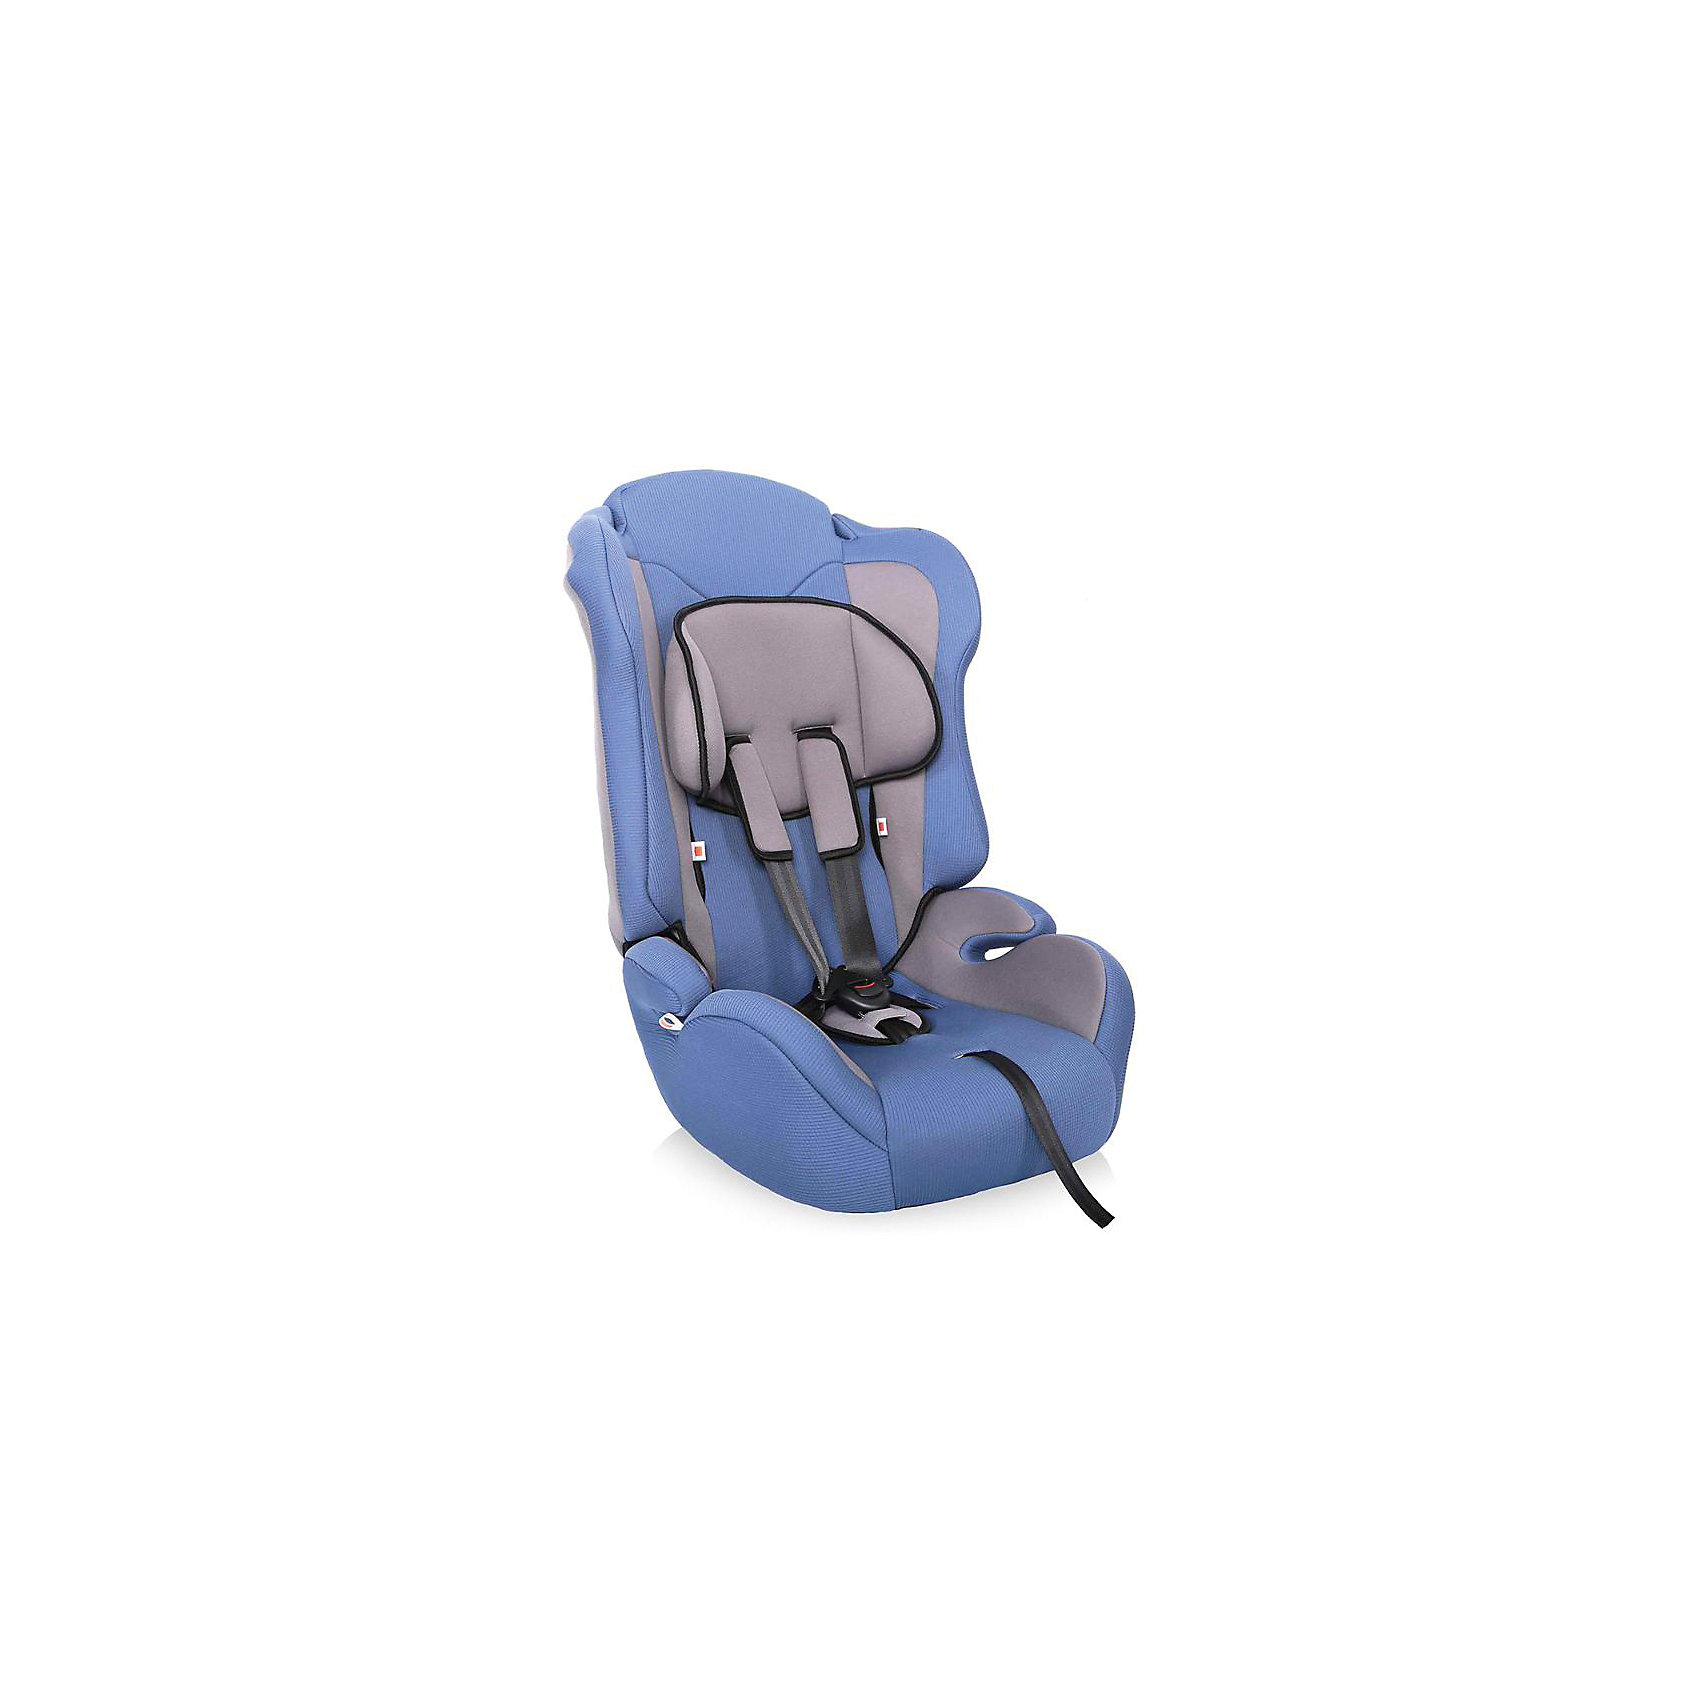 Zlatek Автокресло Atlantic 9-36 кг., Zlatek, синий автокресло zlatek atlantic lux серый 1 12 лет 9 36 кг группа 1 2 3